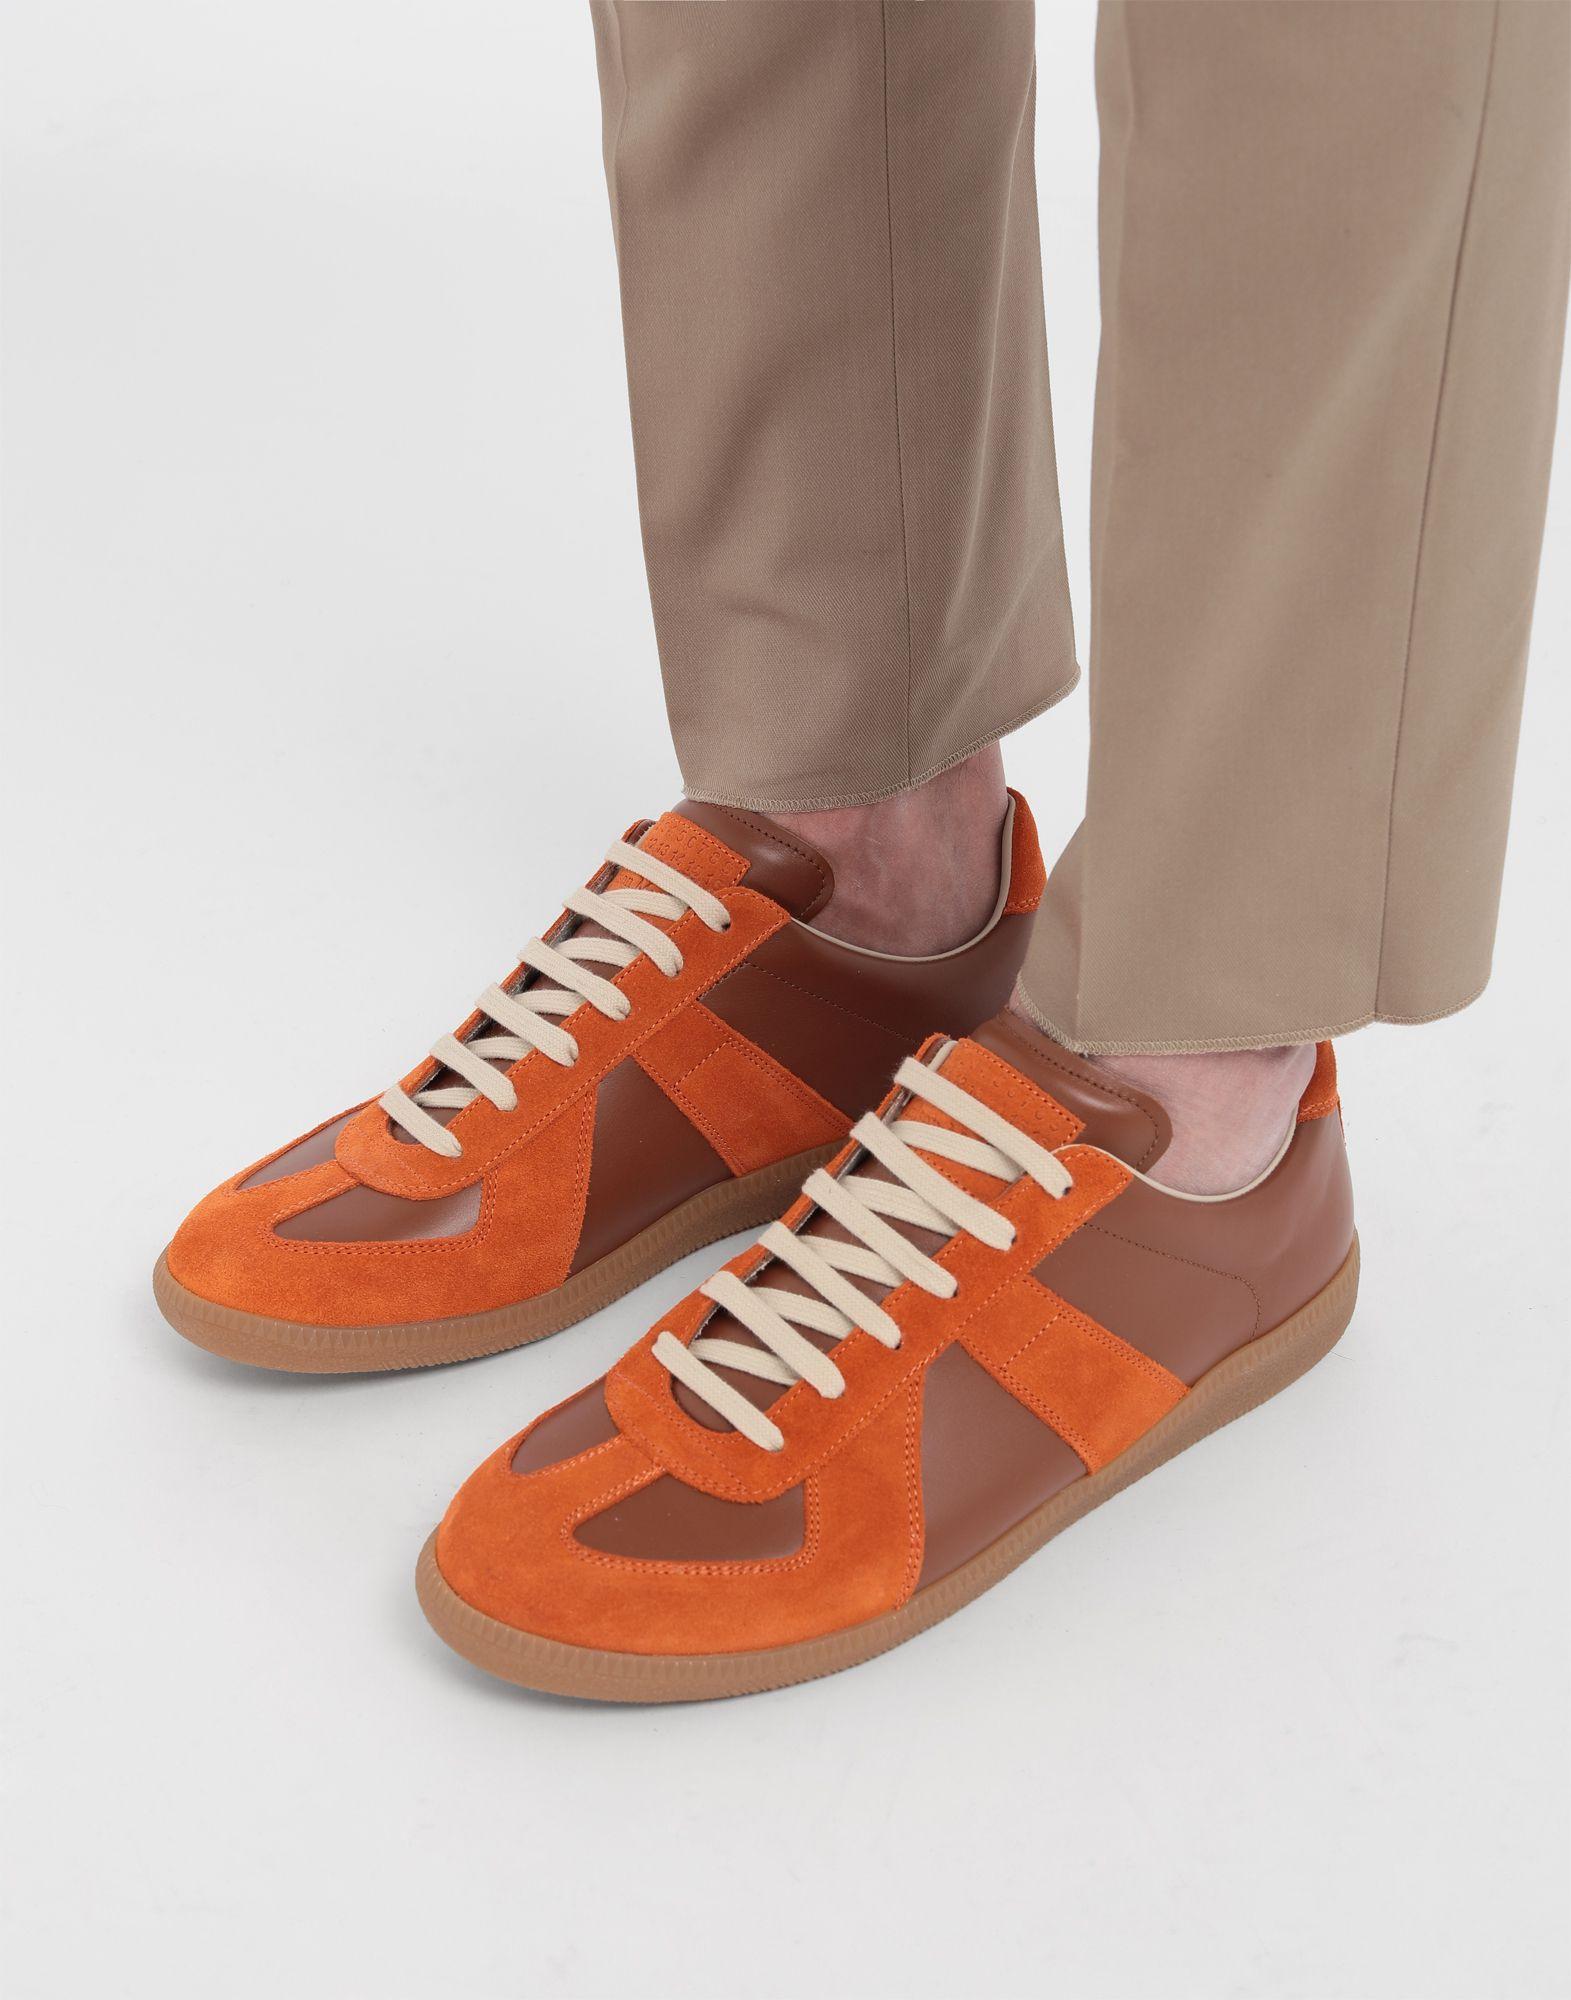 MAISON MARGIELA Replica low top calfskin and suede sneakers Sneakers Man b